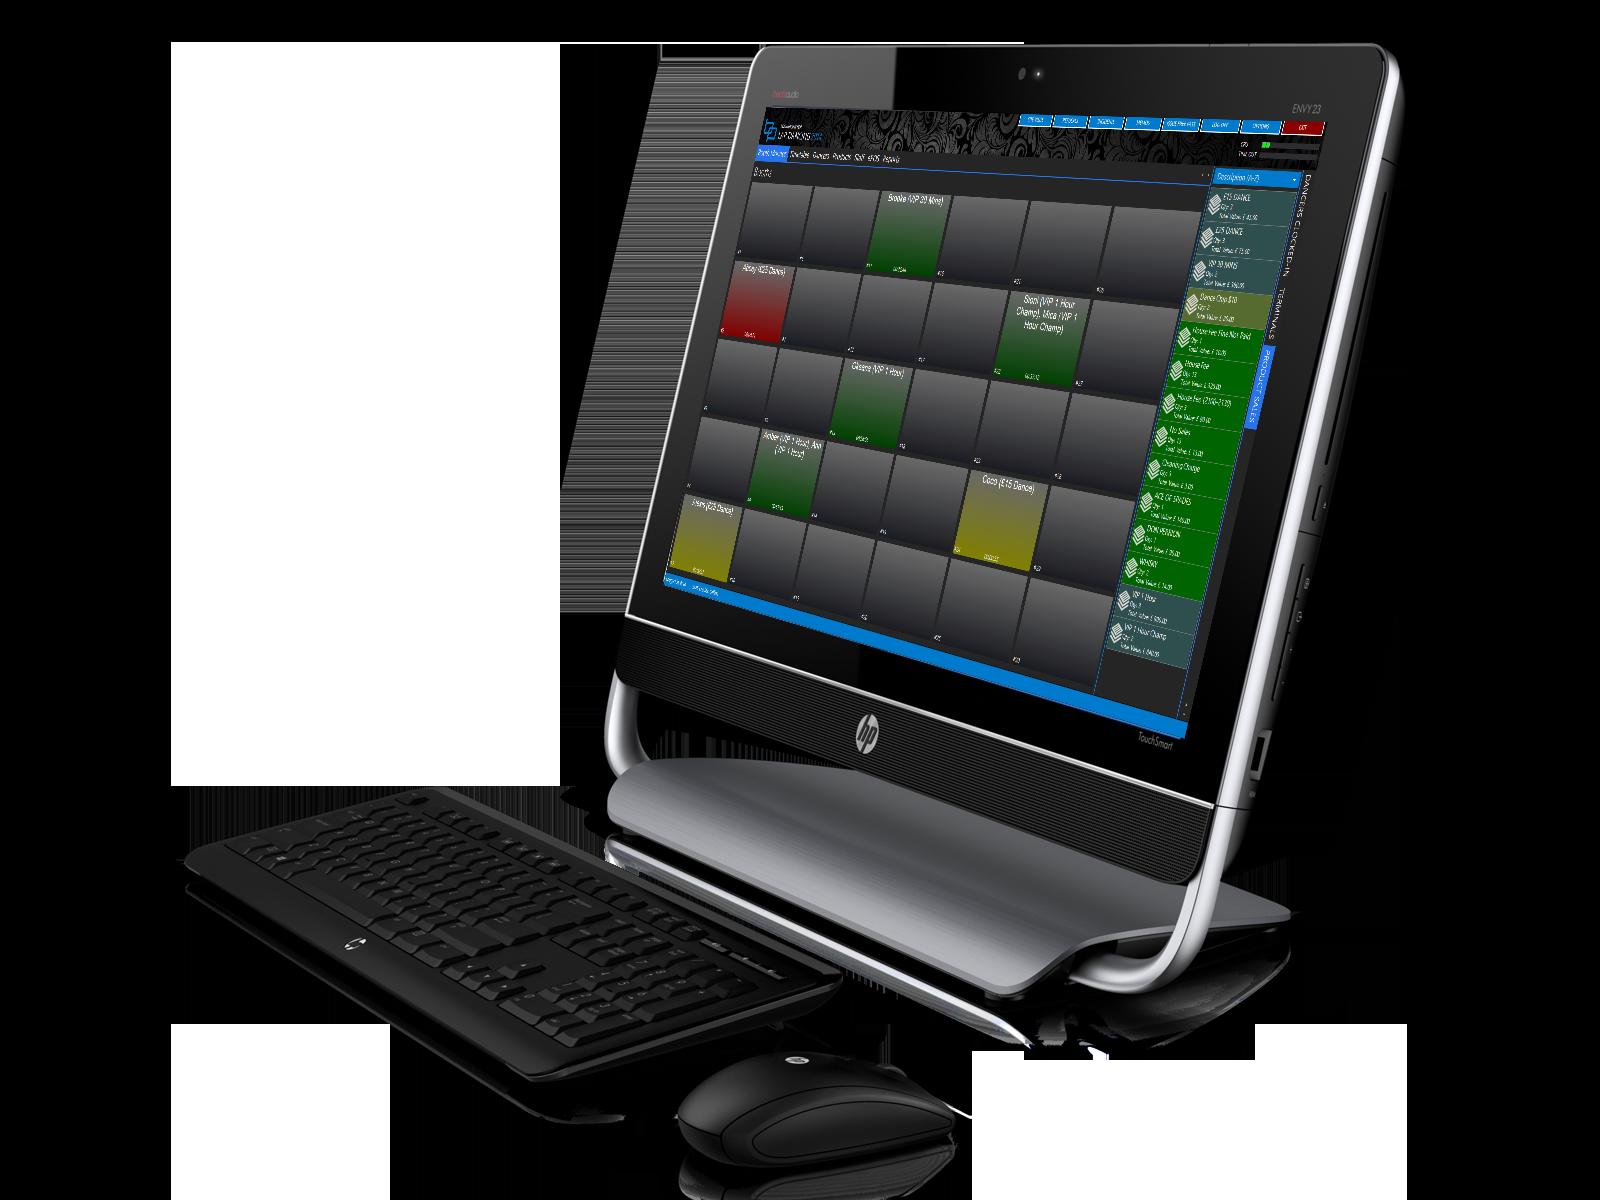 Pos software for strip club